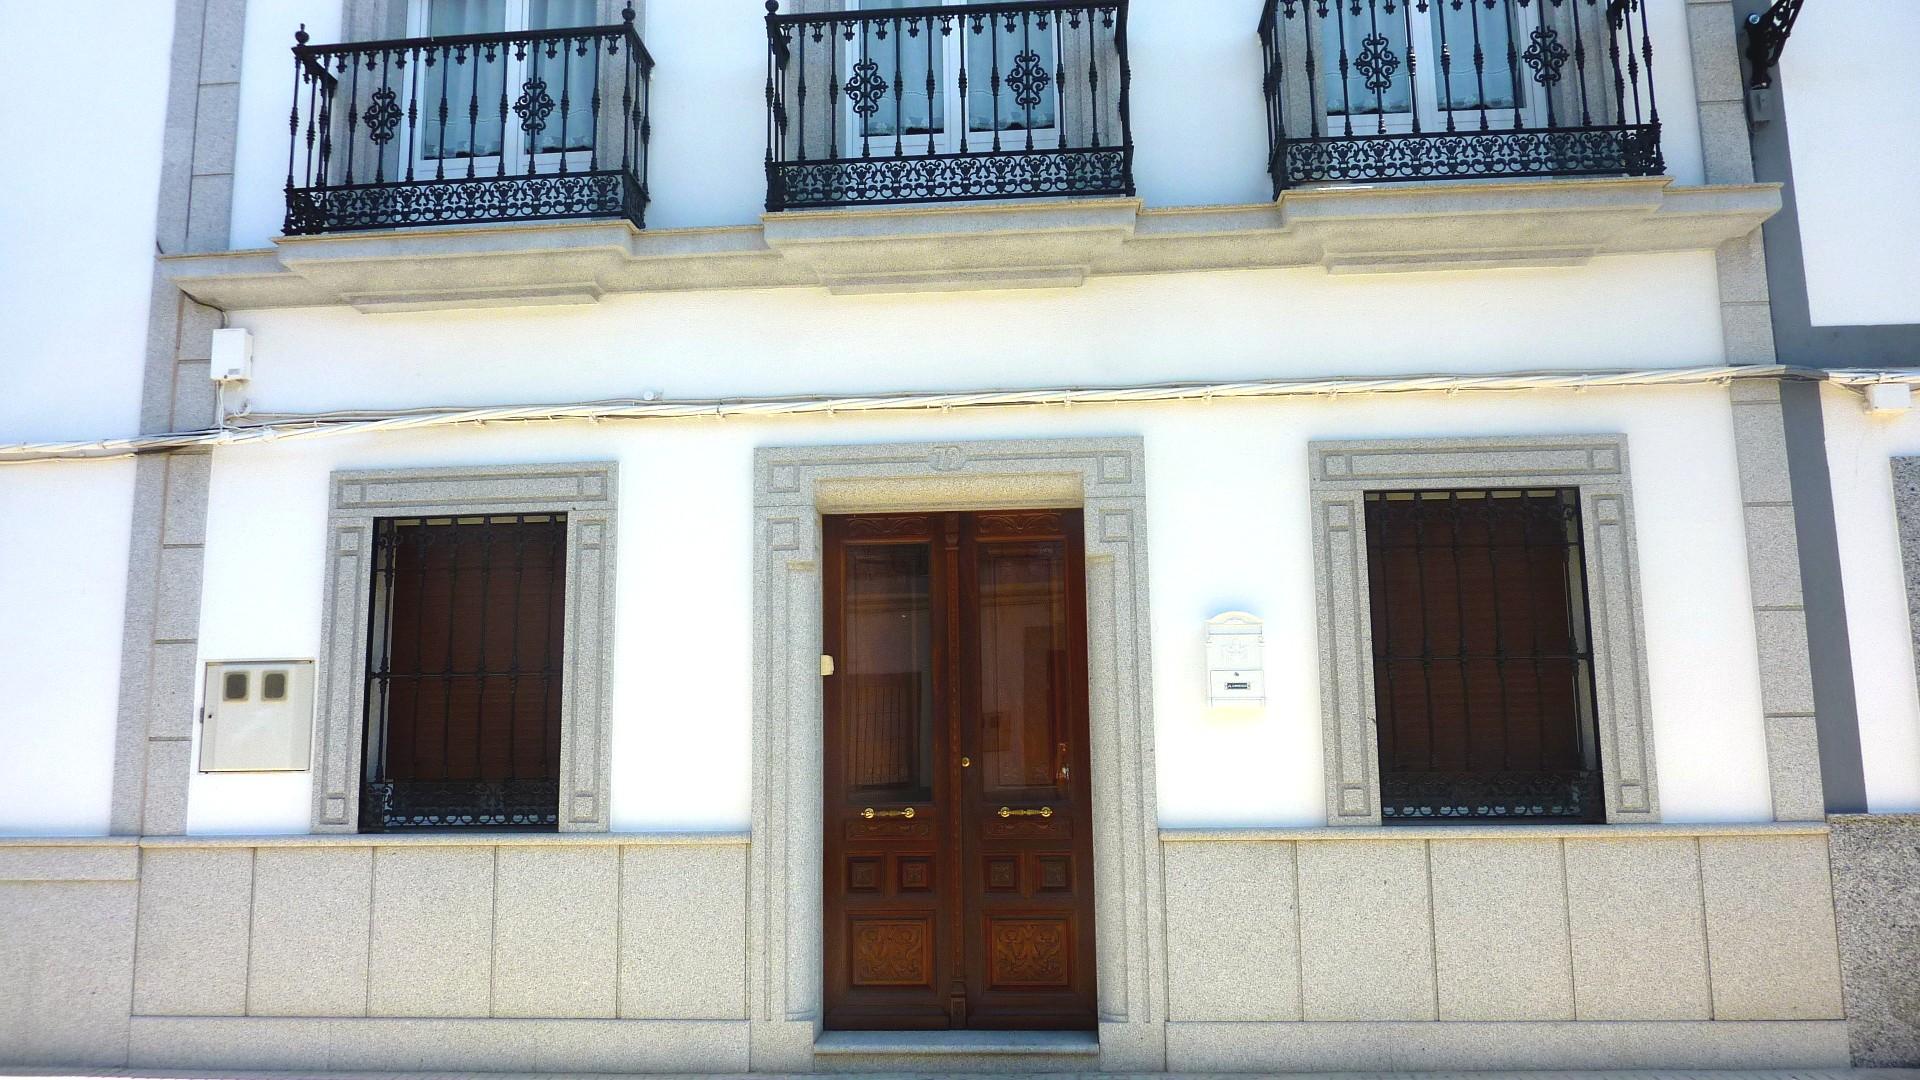 Bonito Fachadas De Casas Andaluzas Componente Ideas de Decoracin